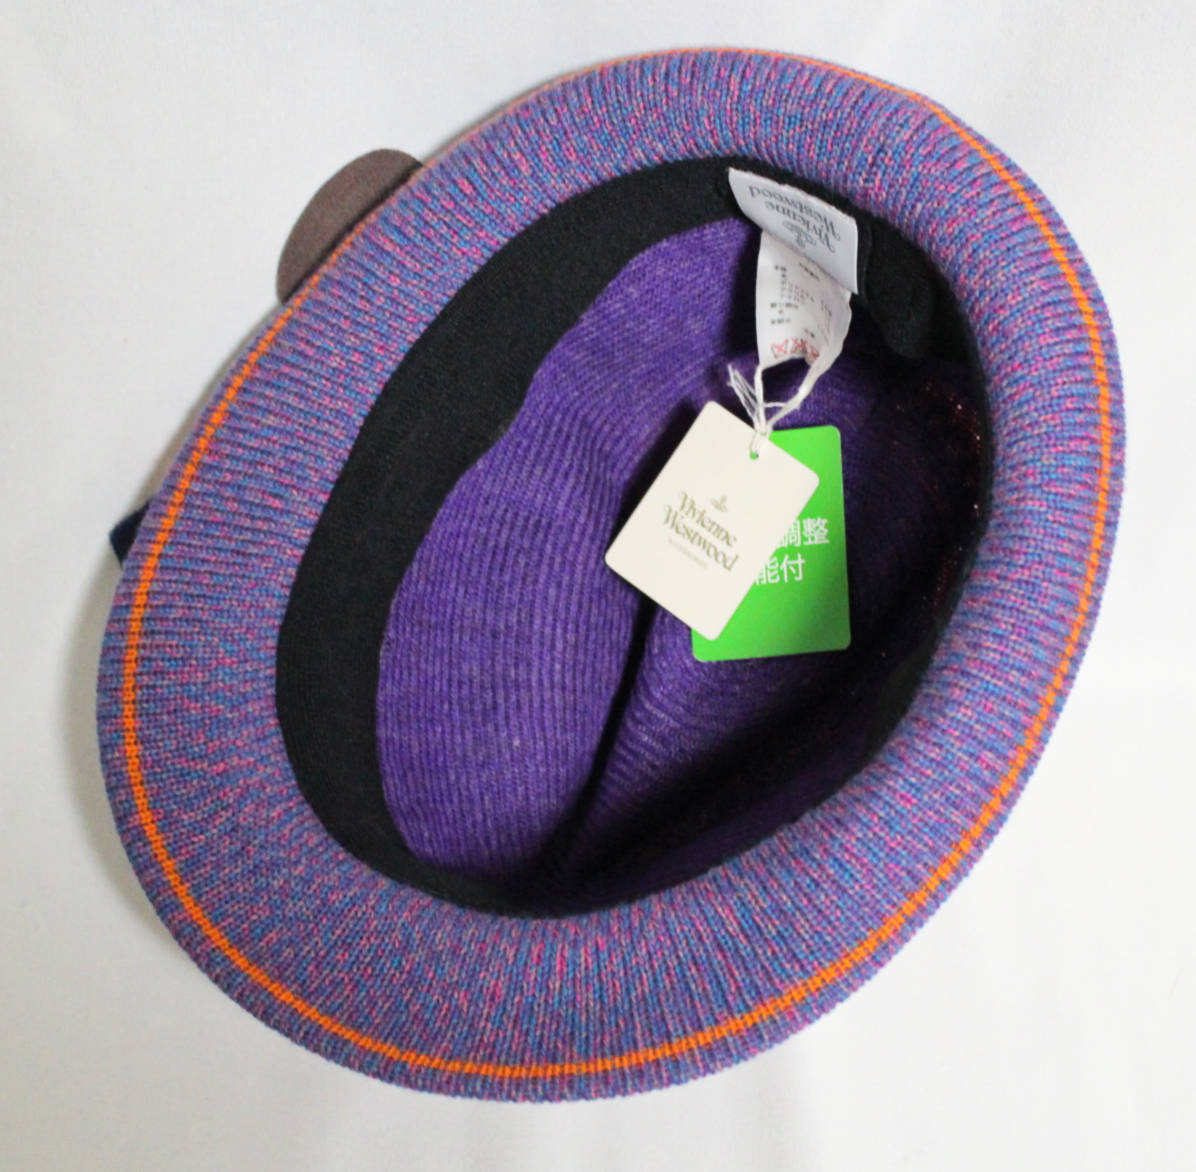 《Vivienne Westwood ヴィヴィアンウエストウッド》 新品 オシャレウールハット 中折れハット S~M(55~58cm サイズ調整可能)A1803